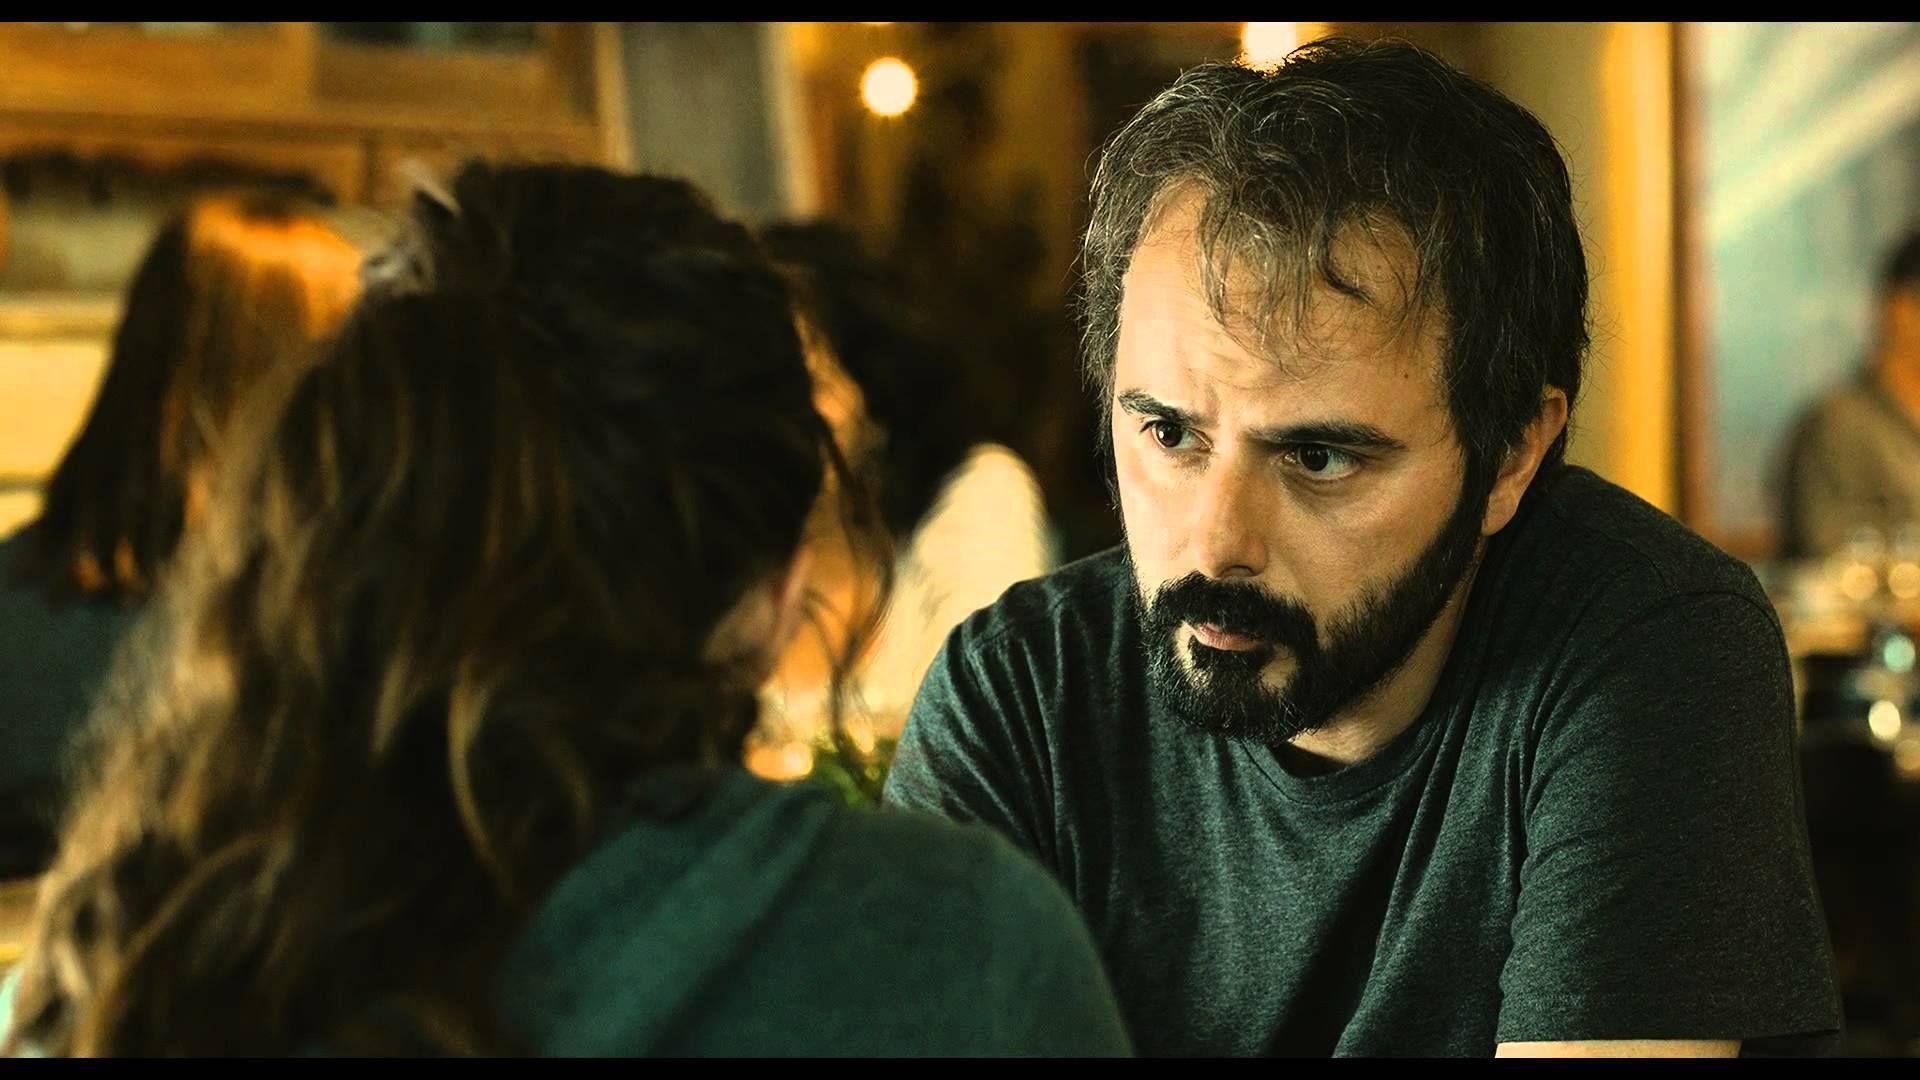 Le passé Asghar Farhadi | Asghar Farhadi | Couple photos ...